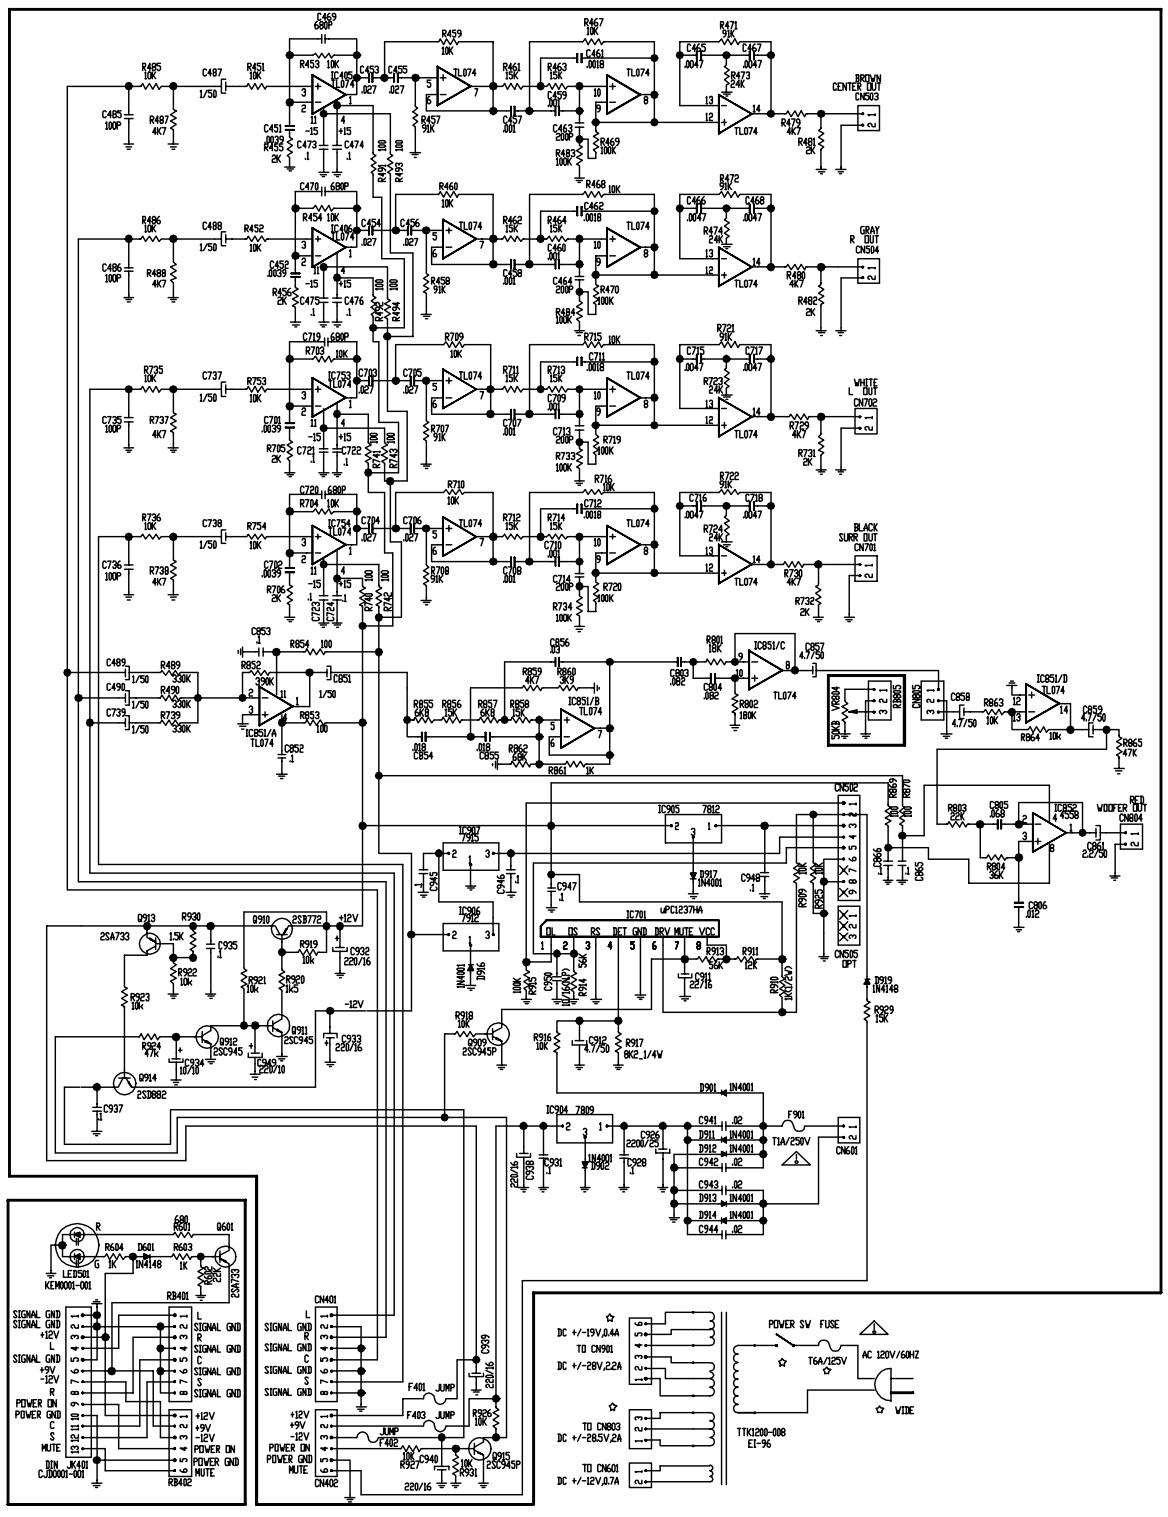 Electrohelponline